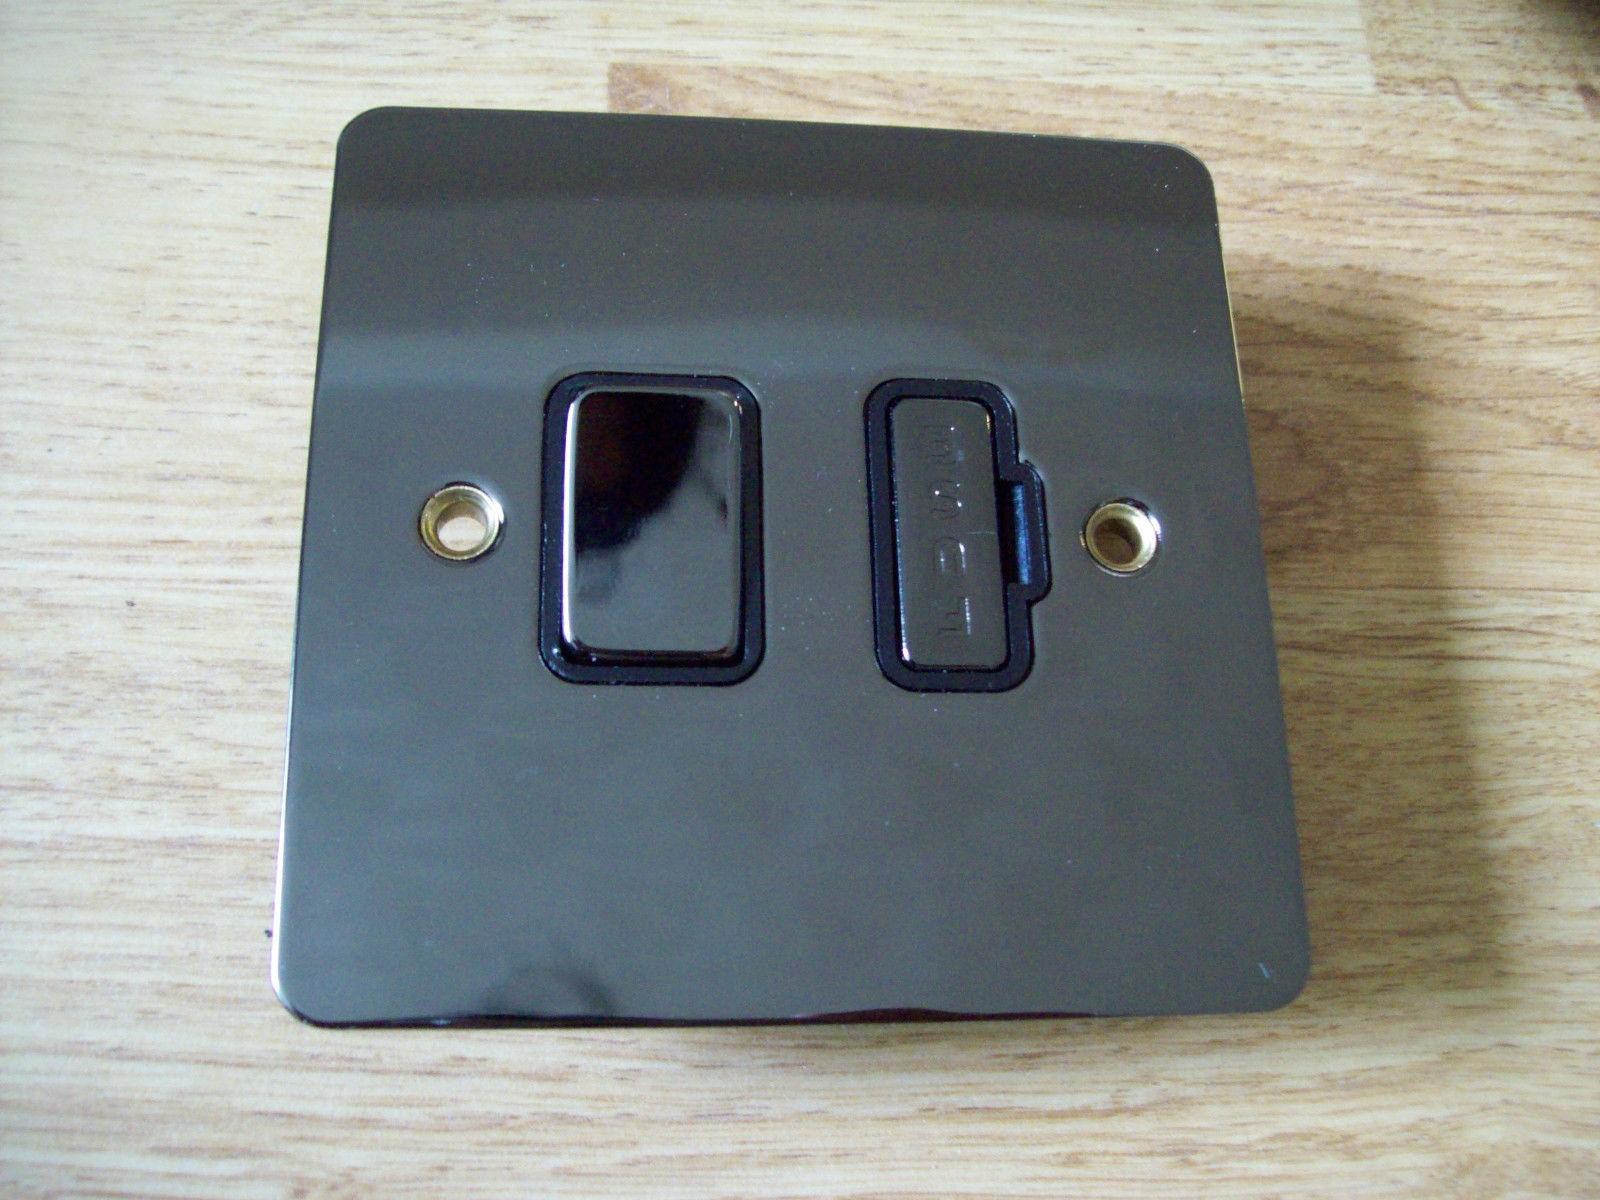 13 Amp Fused Spur In Polished Black Nickel Finish